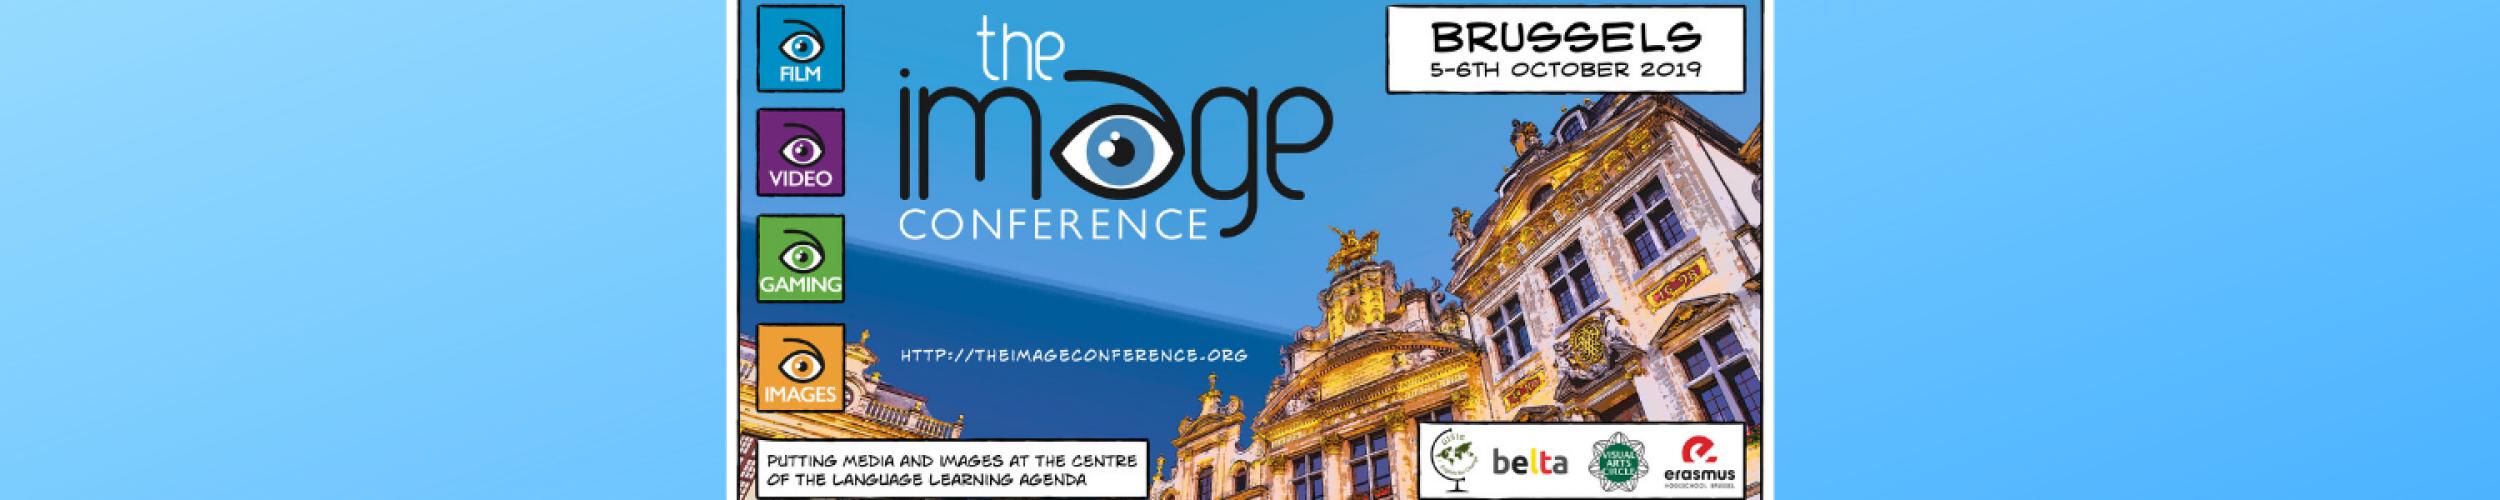 Test Image Conference